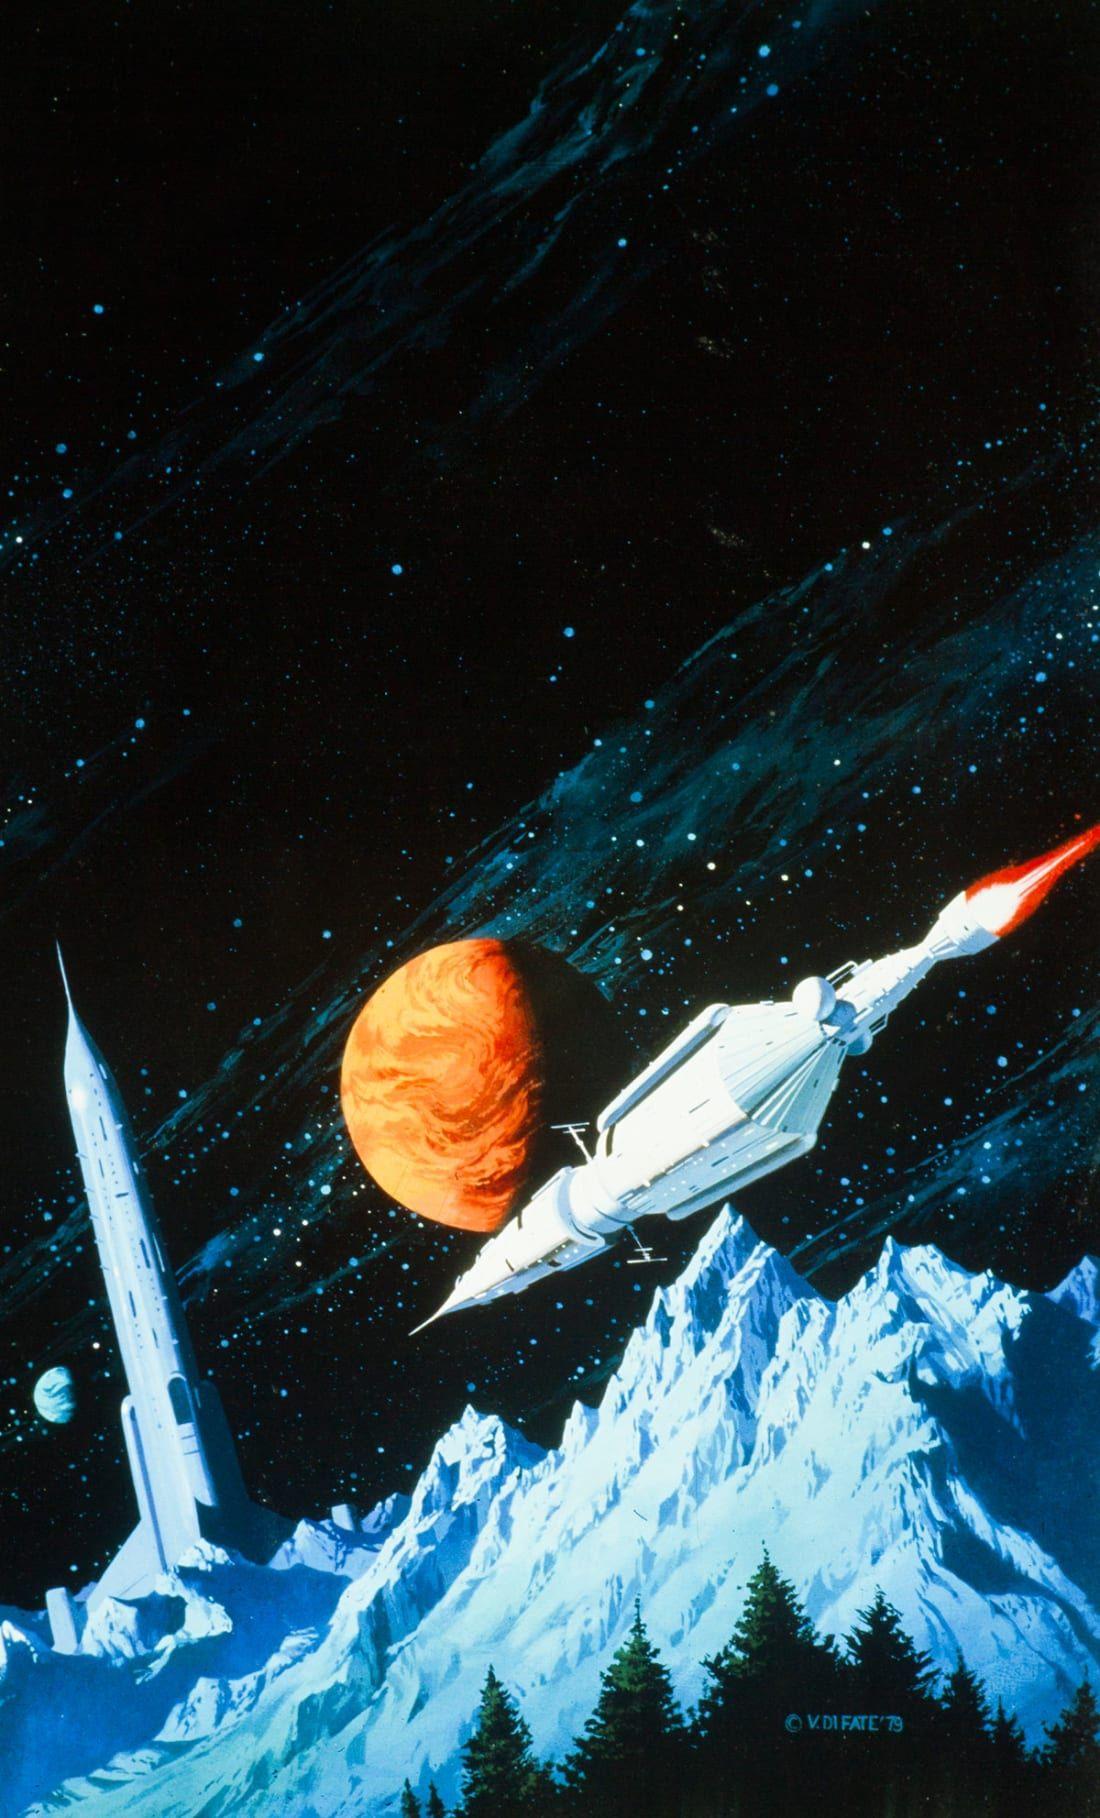 Stunning Sci Fi Art Spaceships Sci Fi Wallpaper Sci Fi Art 70s Sci Fi Art